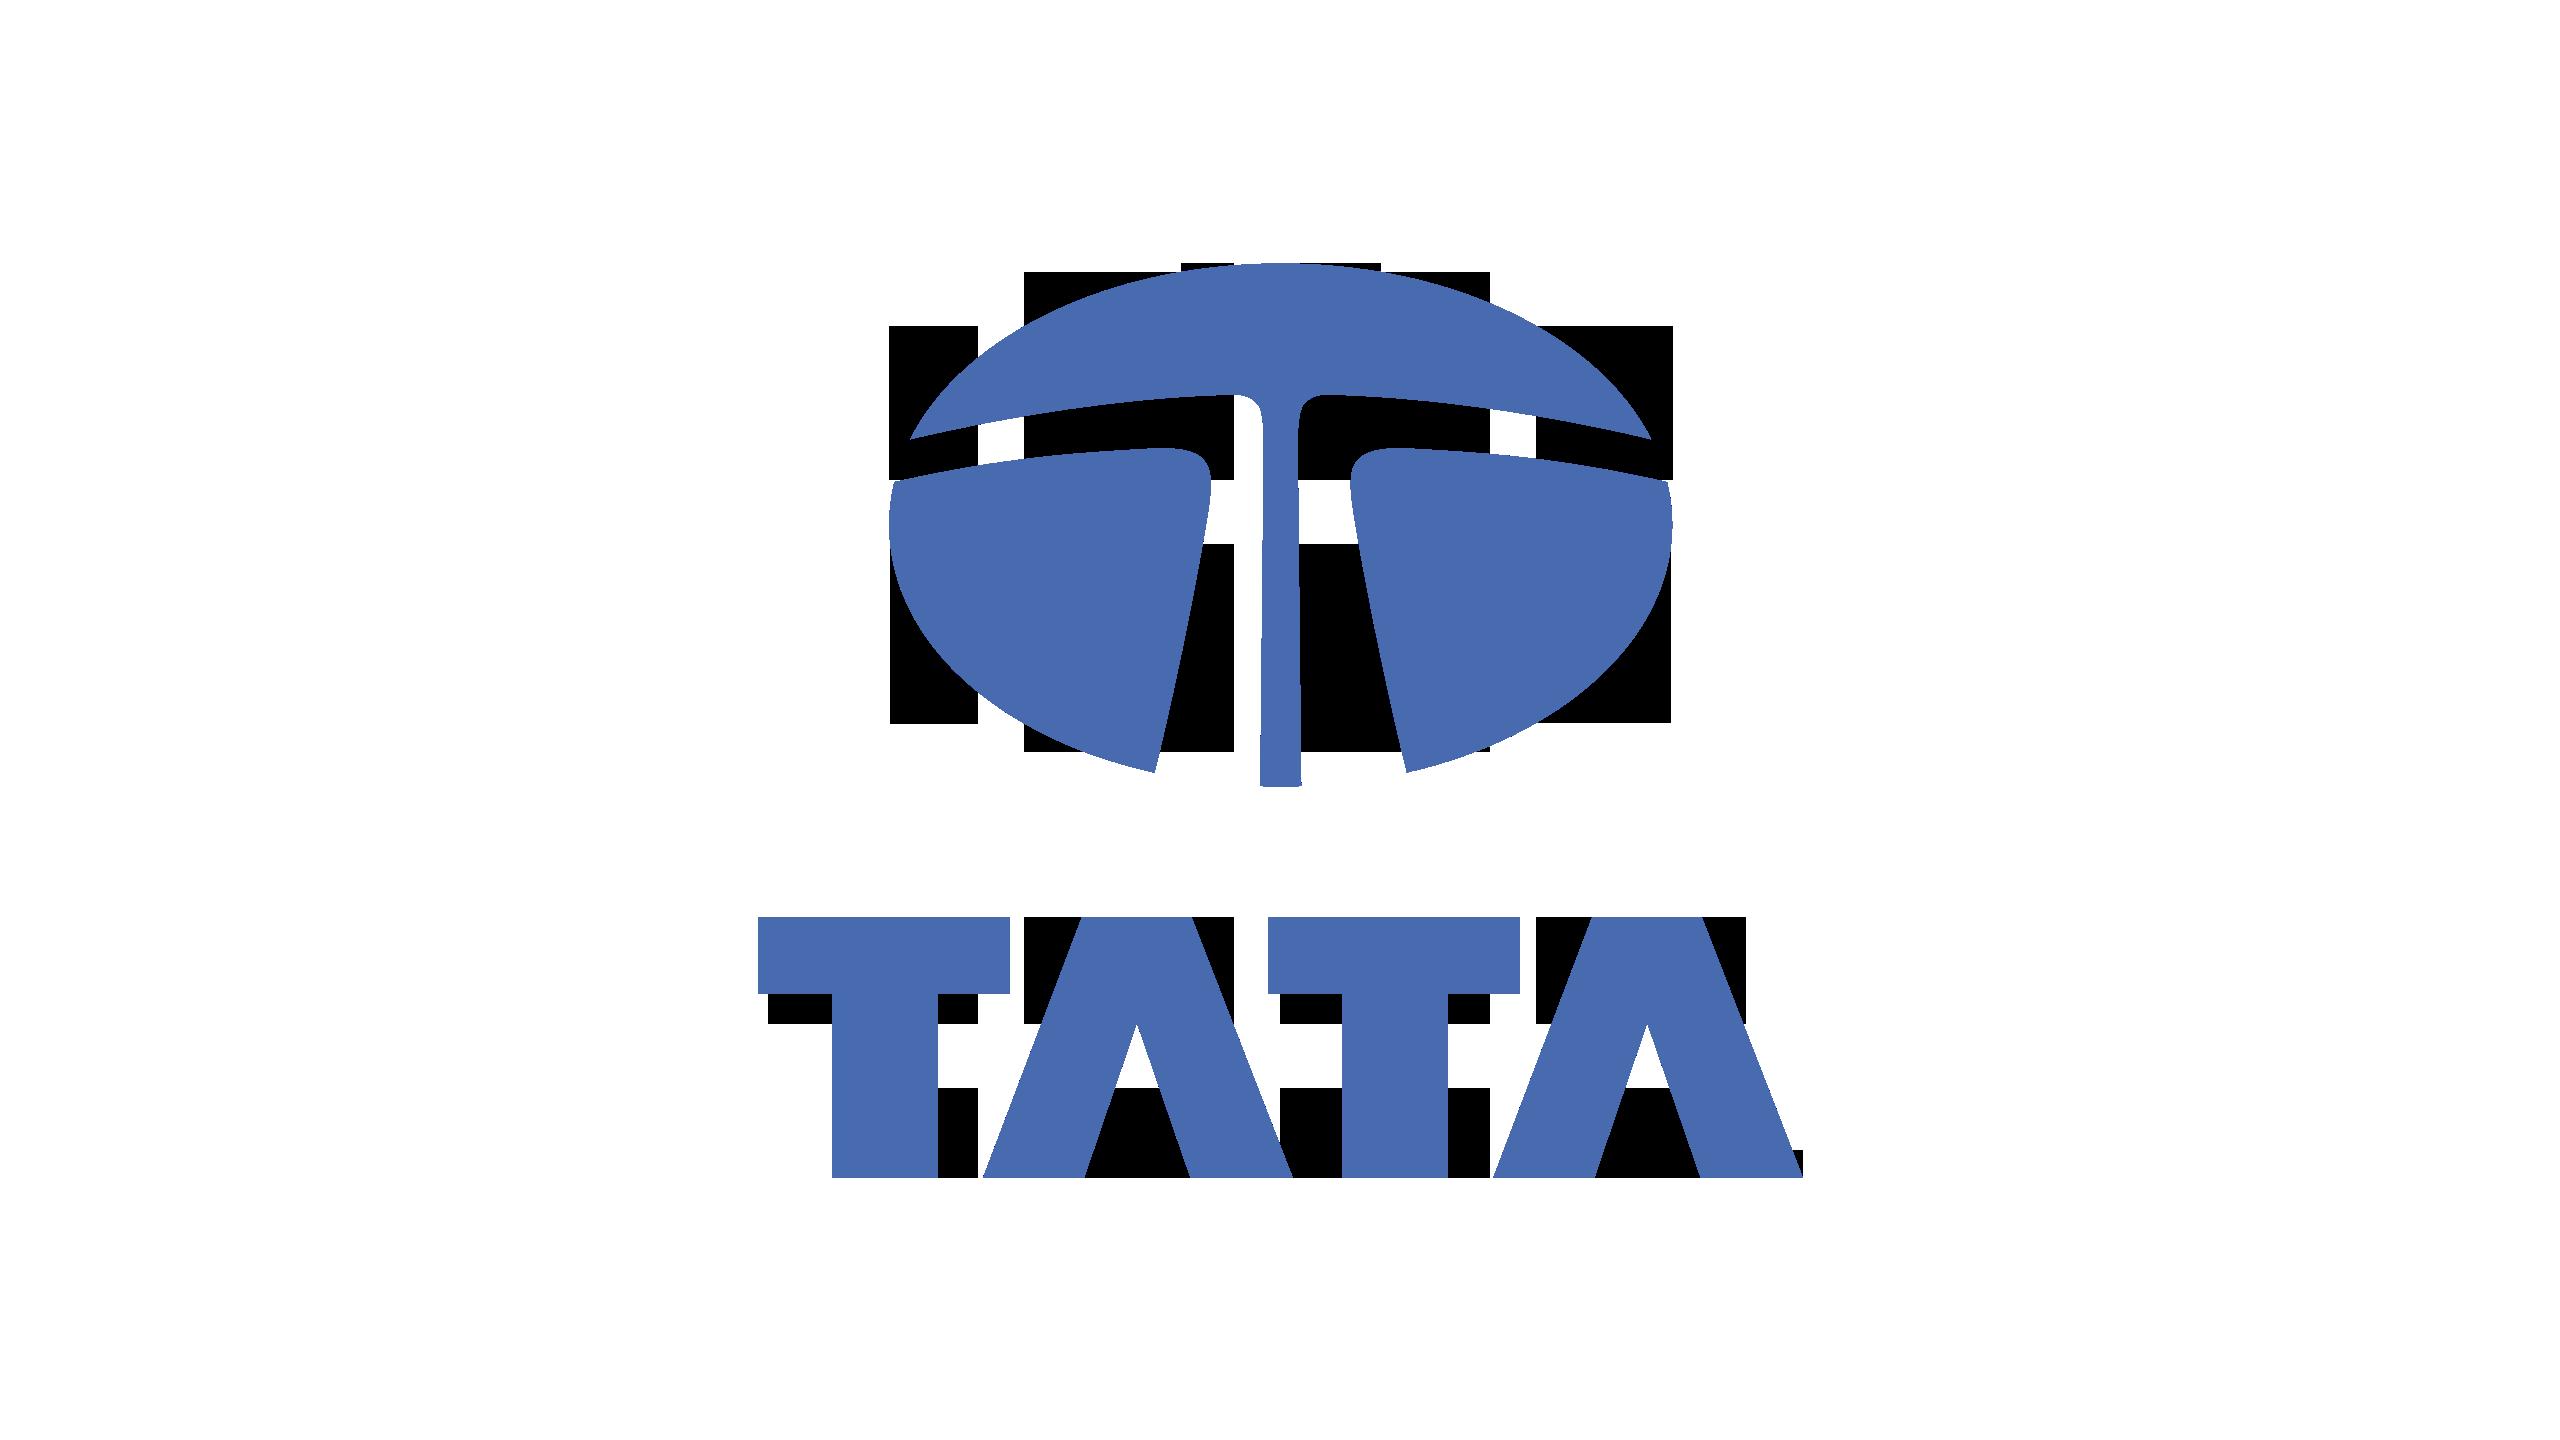 Tata Logo (2000-Present) 2560x1440 HD png - Tata PNG